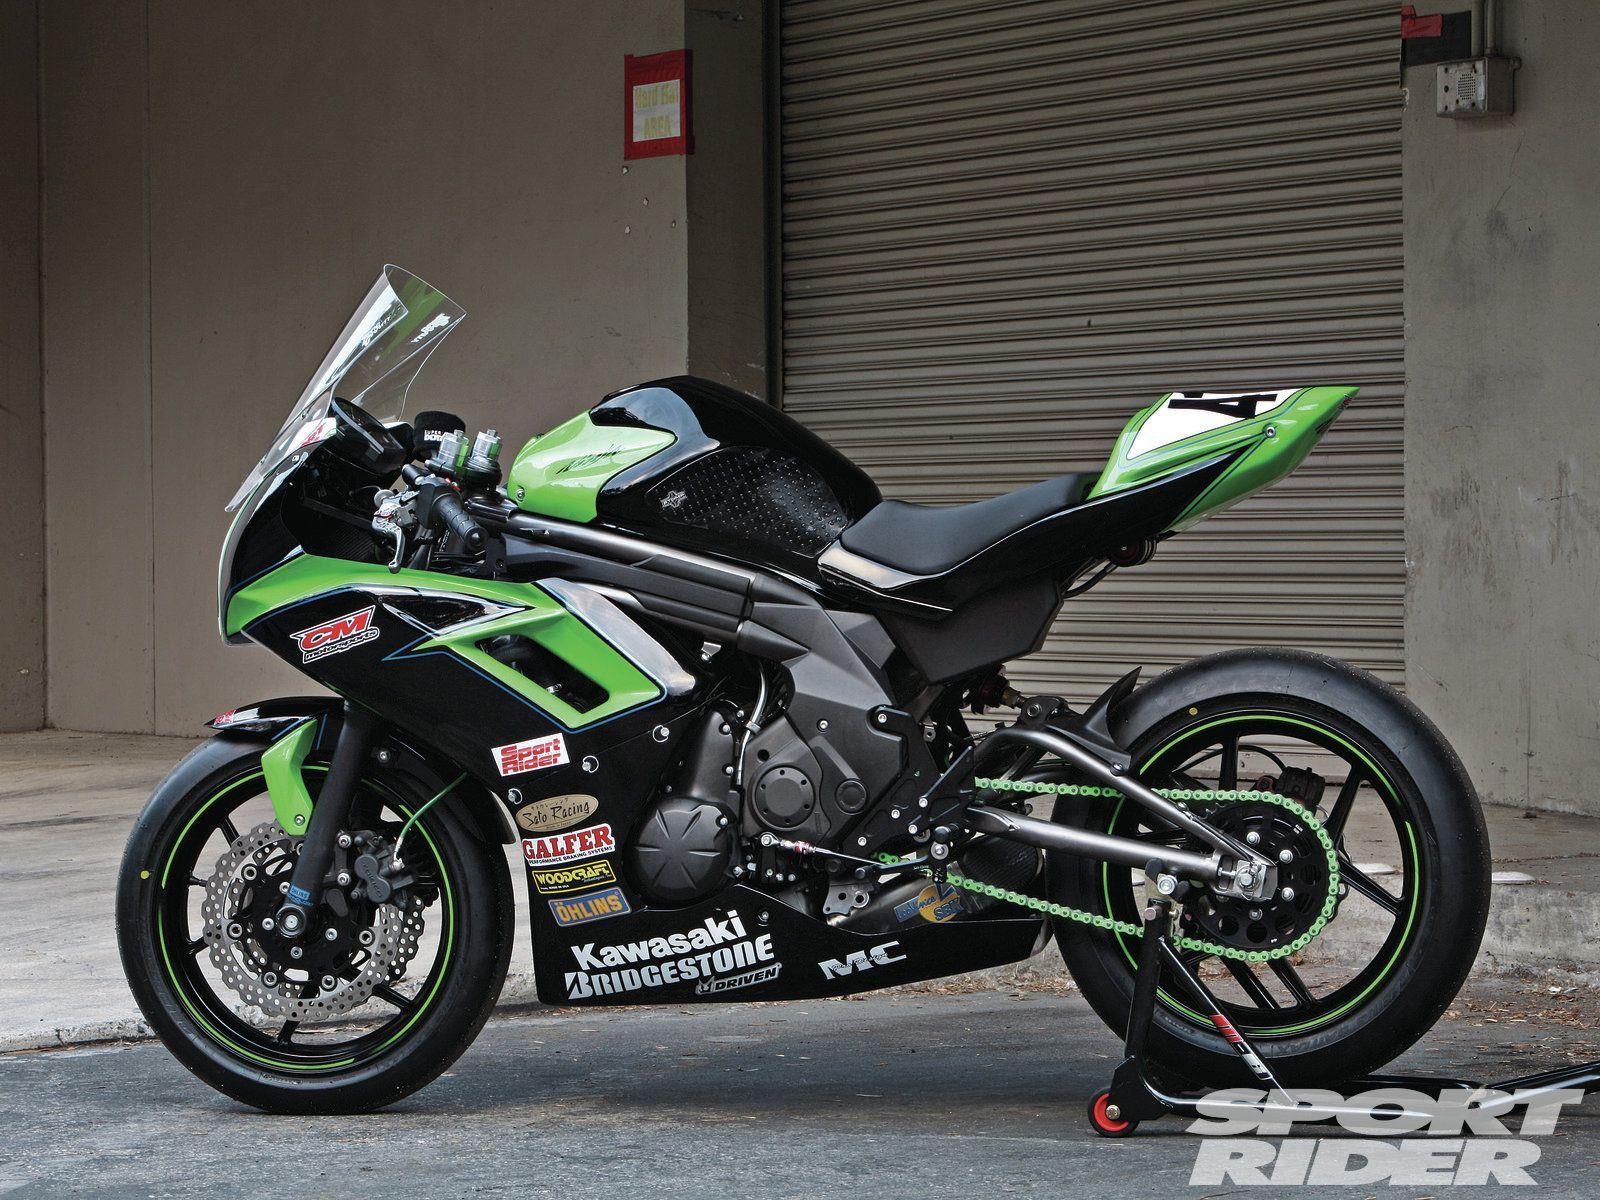 kawasaki ninja 650 racebike | kawasaki motorcycles | pinterest